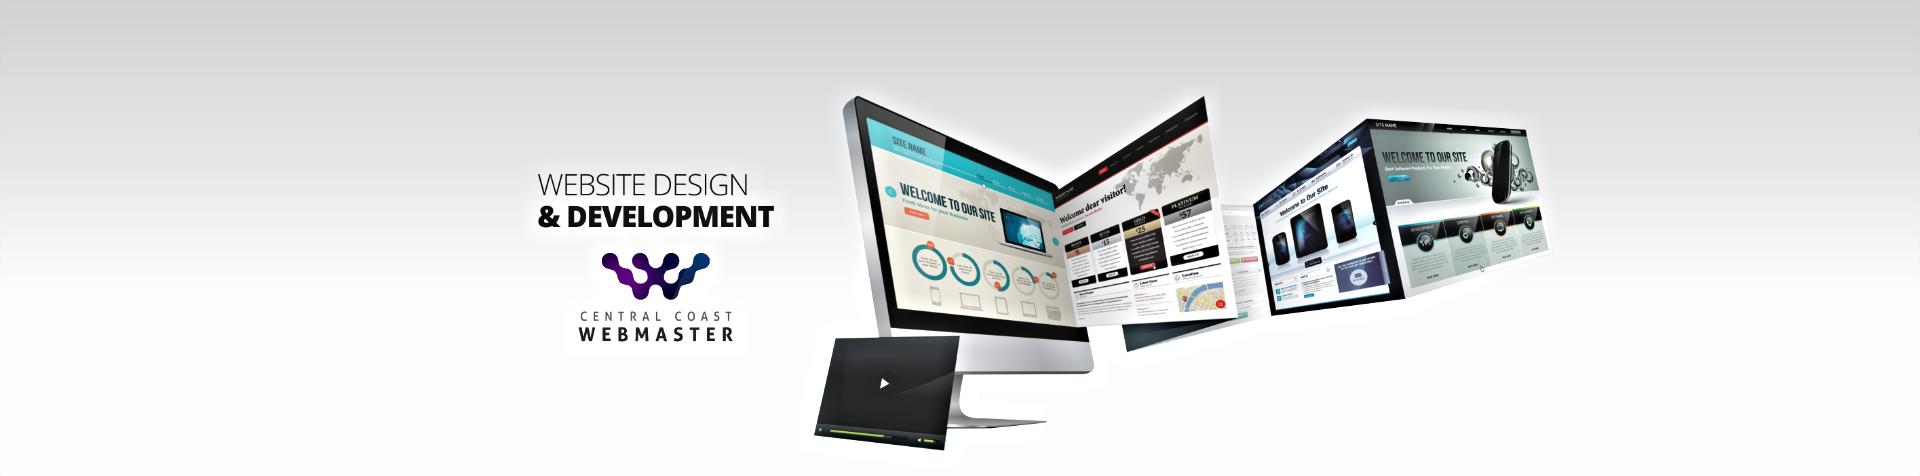 Central Coast Webmaster Design & Development